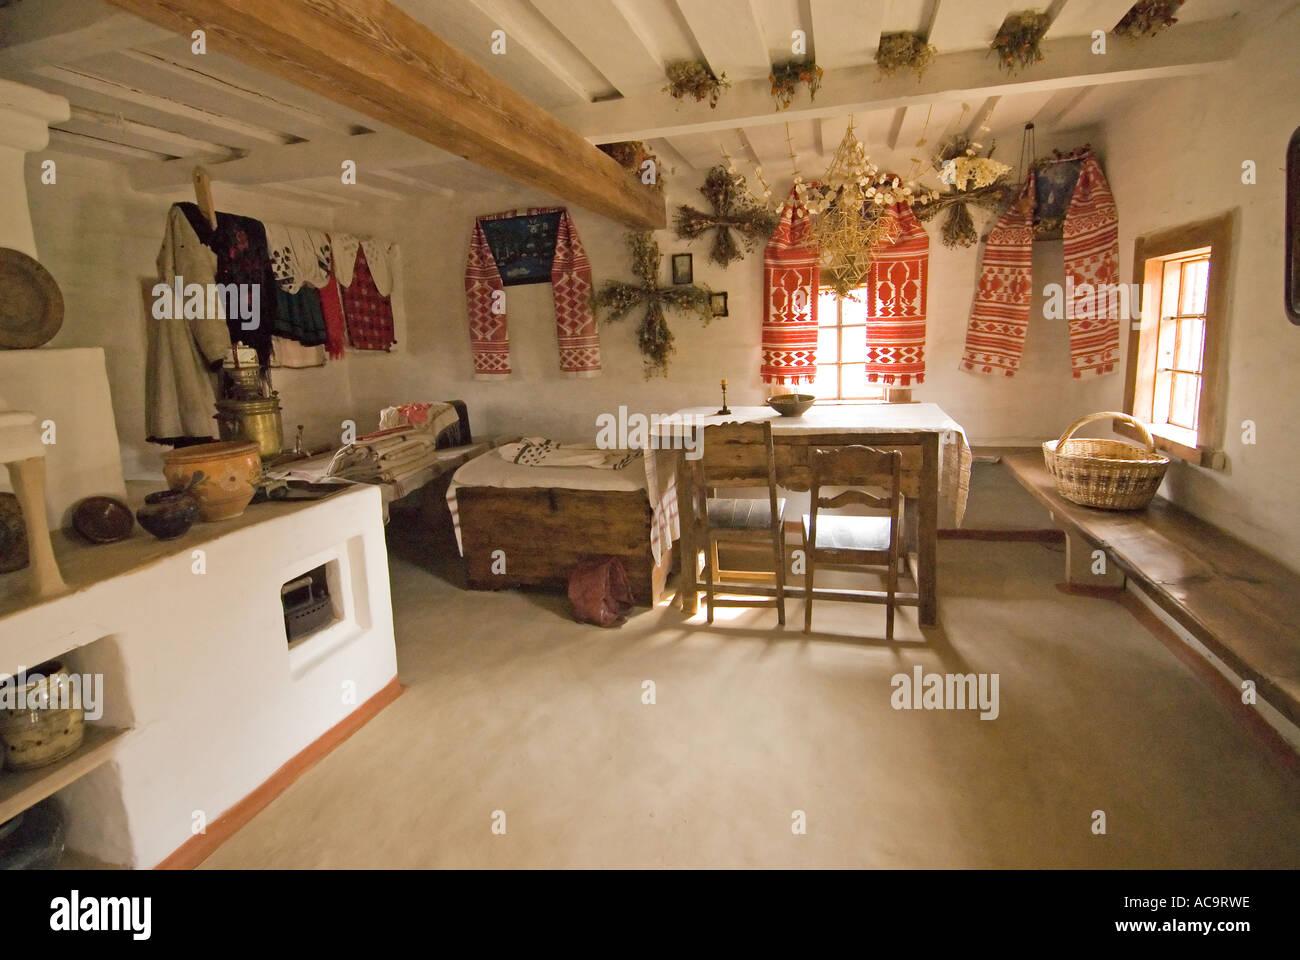 Interni Di Una Casa Di Campagna : Interno tipico di una casa di campagna a pyrohovo museo di